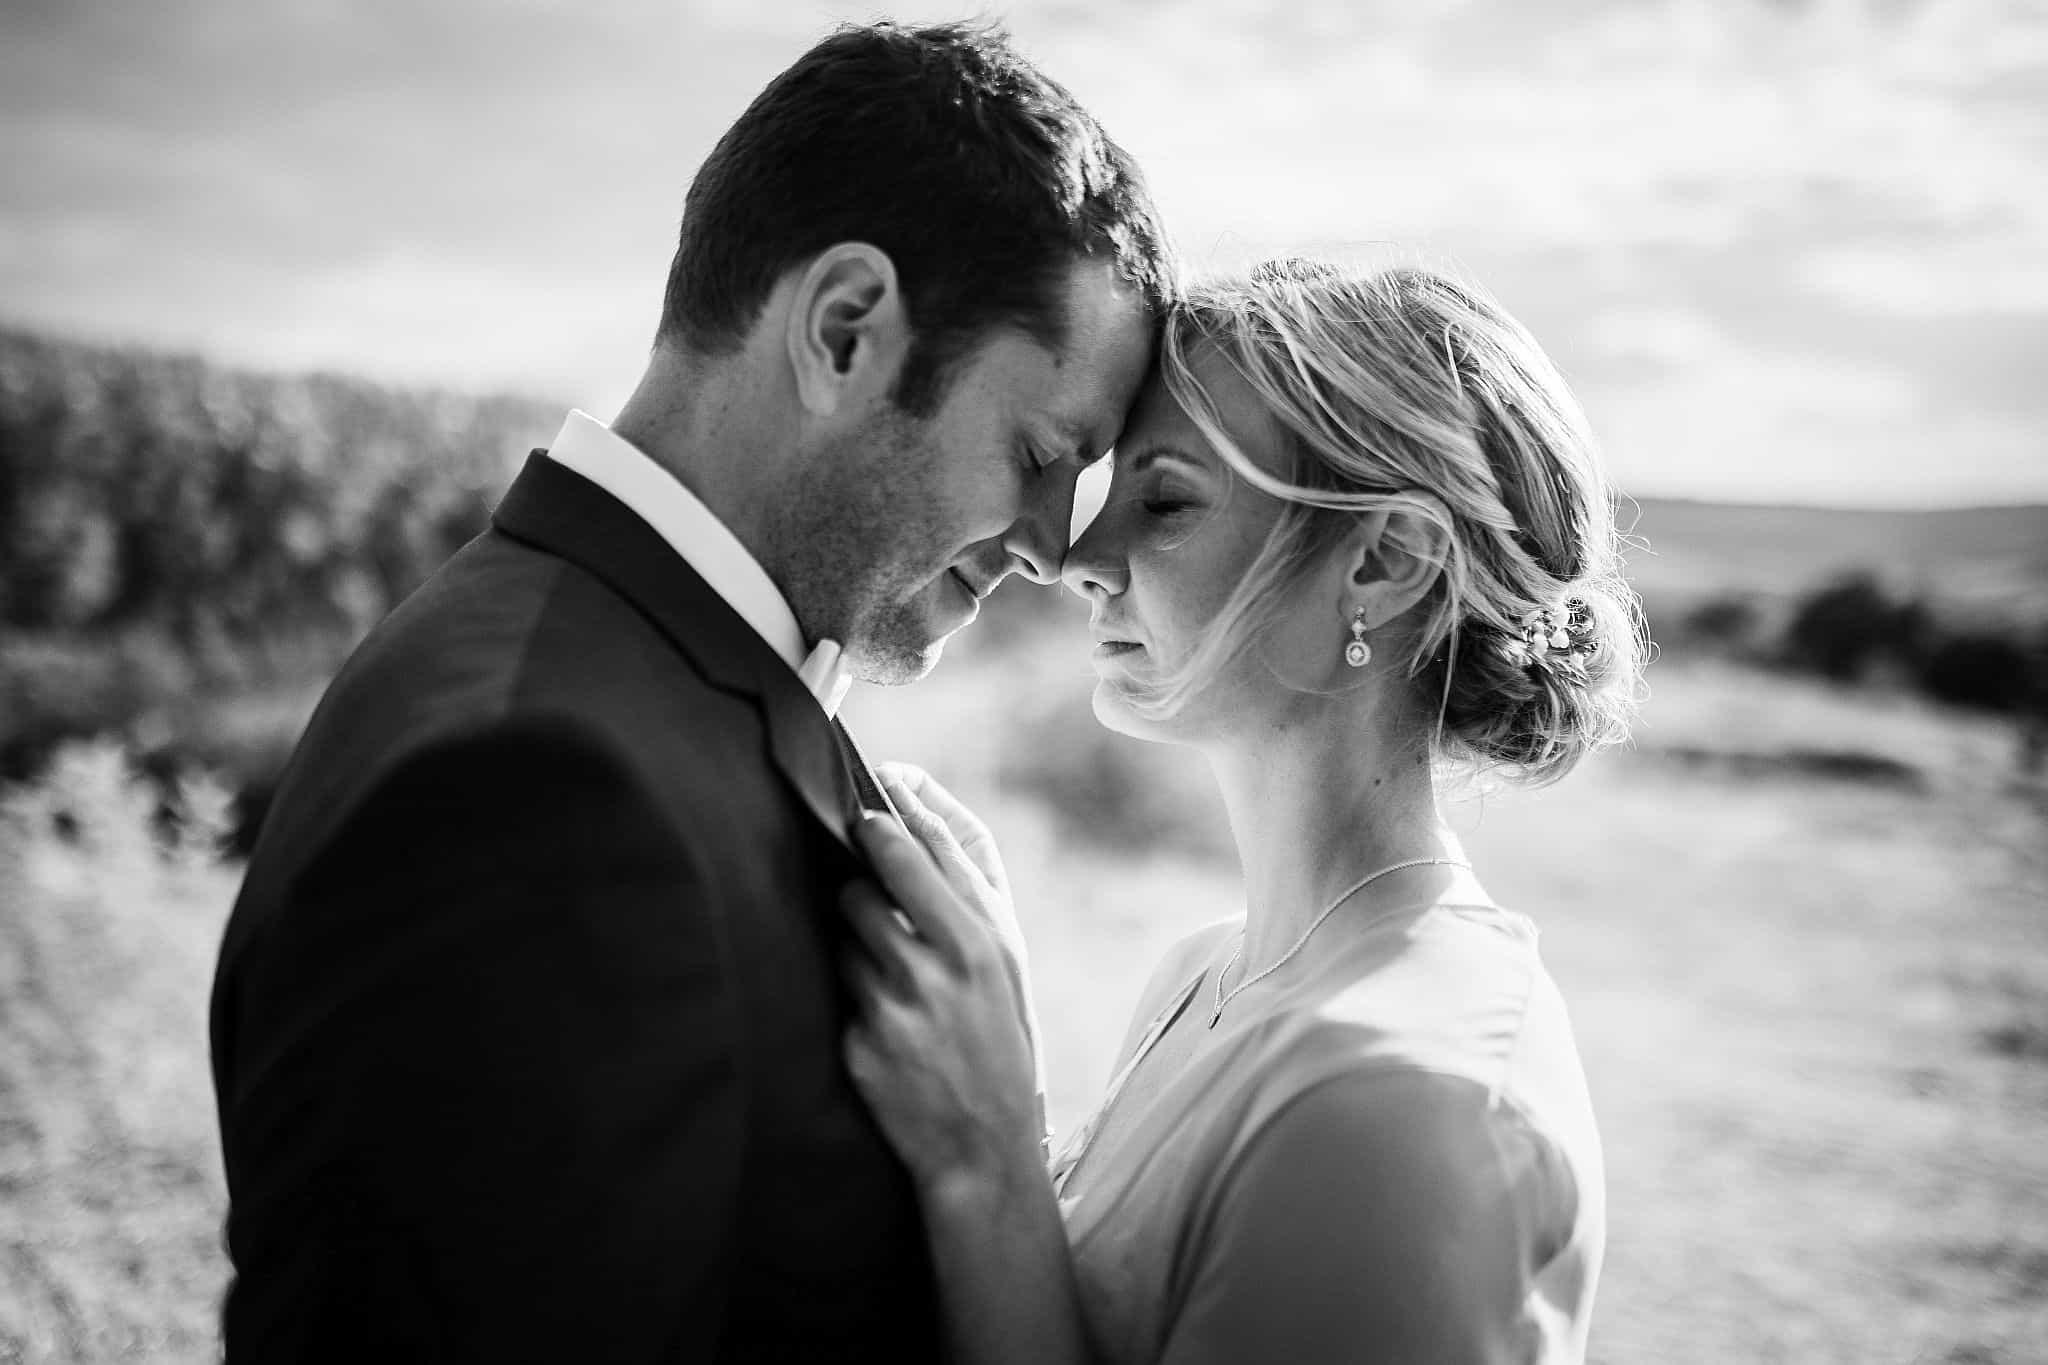 Shooting als Hochzeitsfotograf Limburg an der Lahn